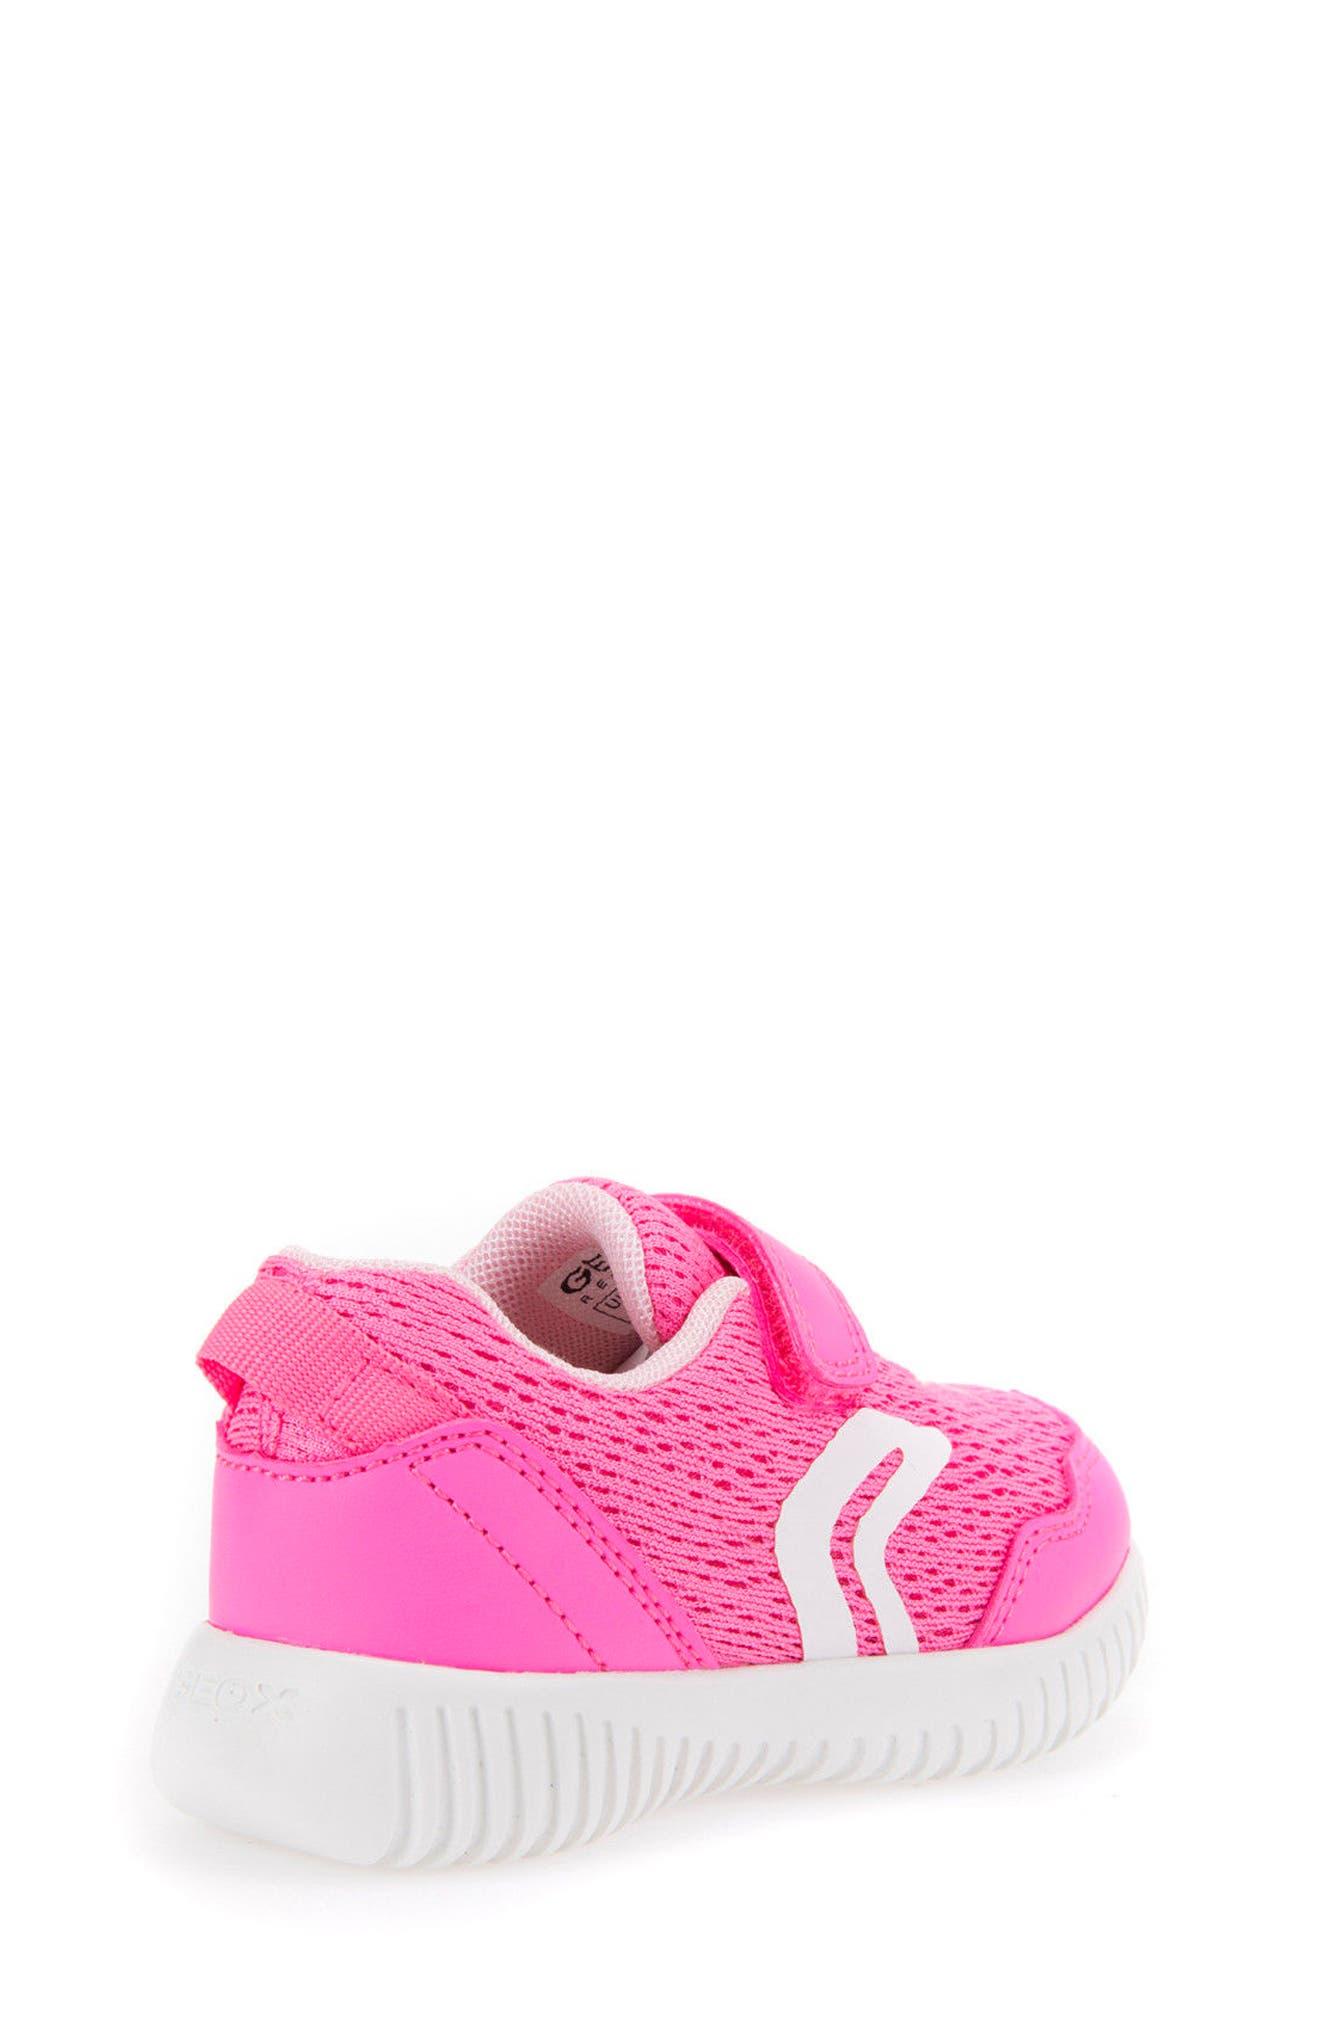 Waviness Sneaker,                             Alternate thumbnail 2, color,                             Fluorescent Fuchsia